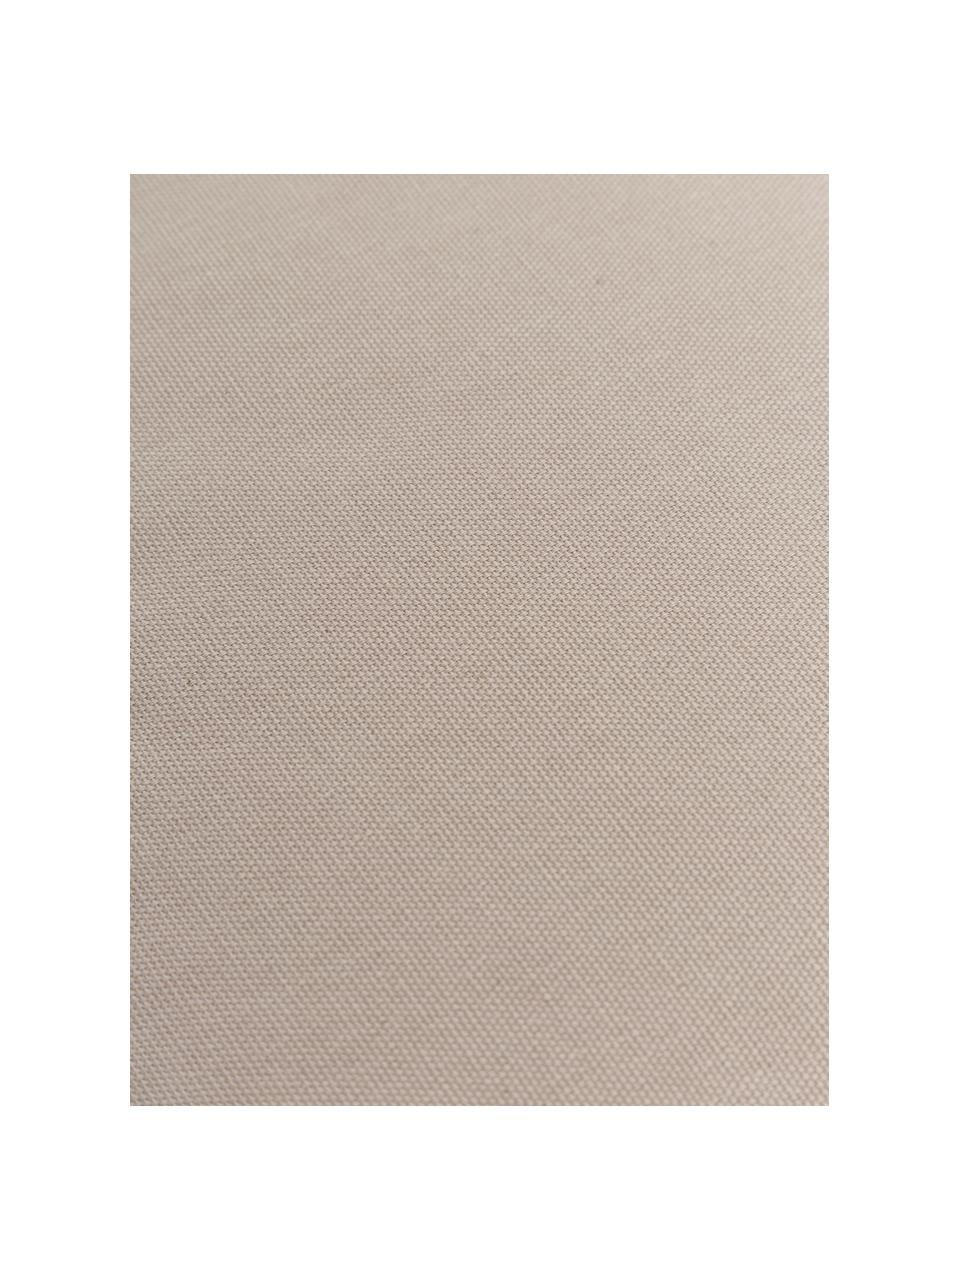 Cuscino sedia taupe Zoey, Rivestimento: 100% cotone, Beige, Larg. 40 x Lung. 40 cm